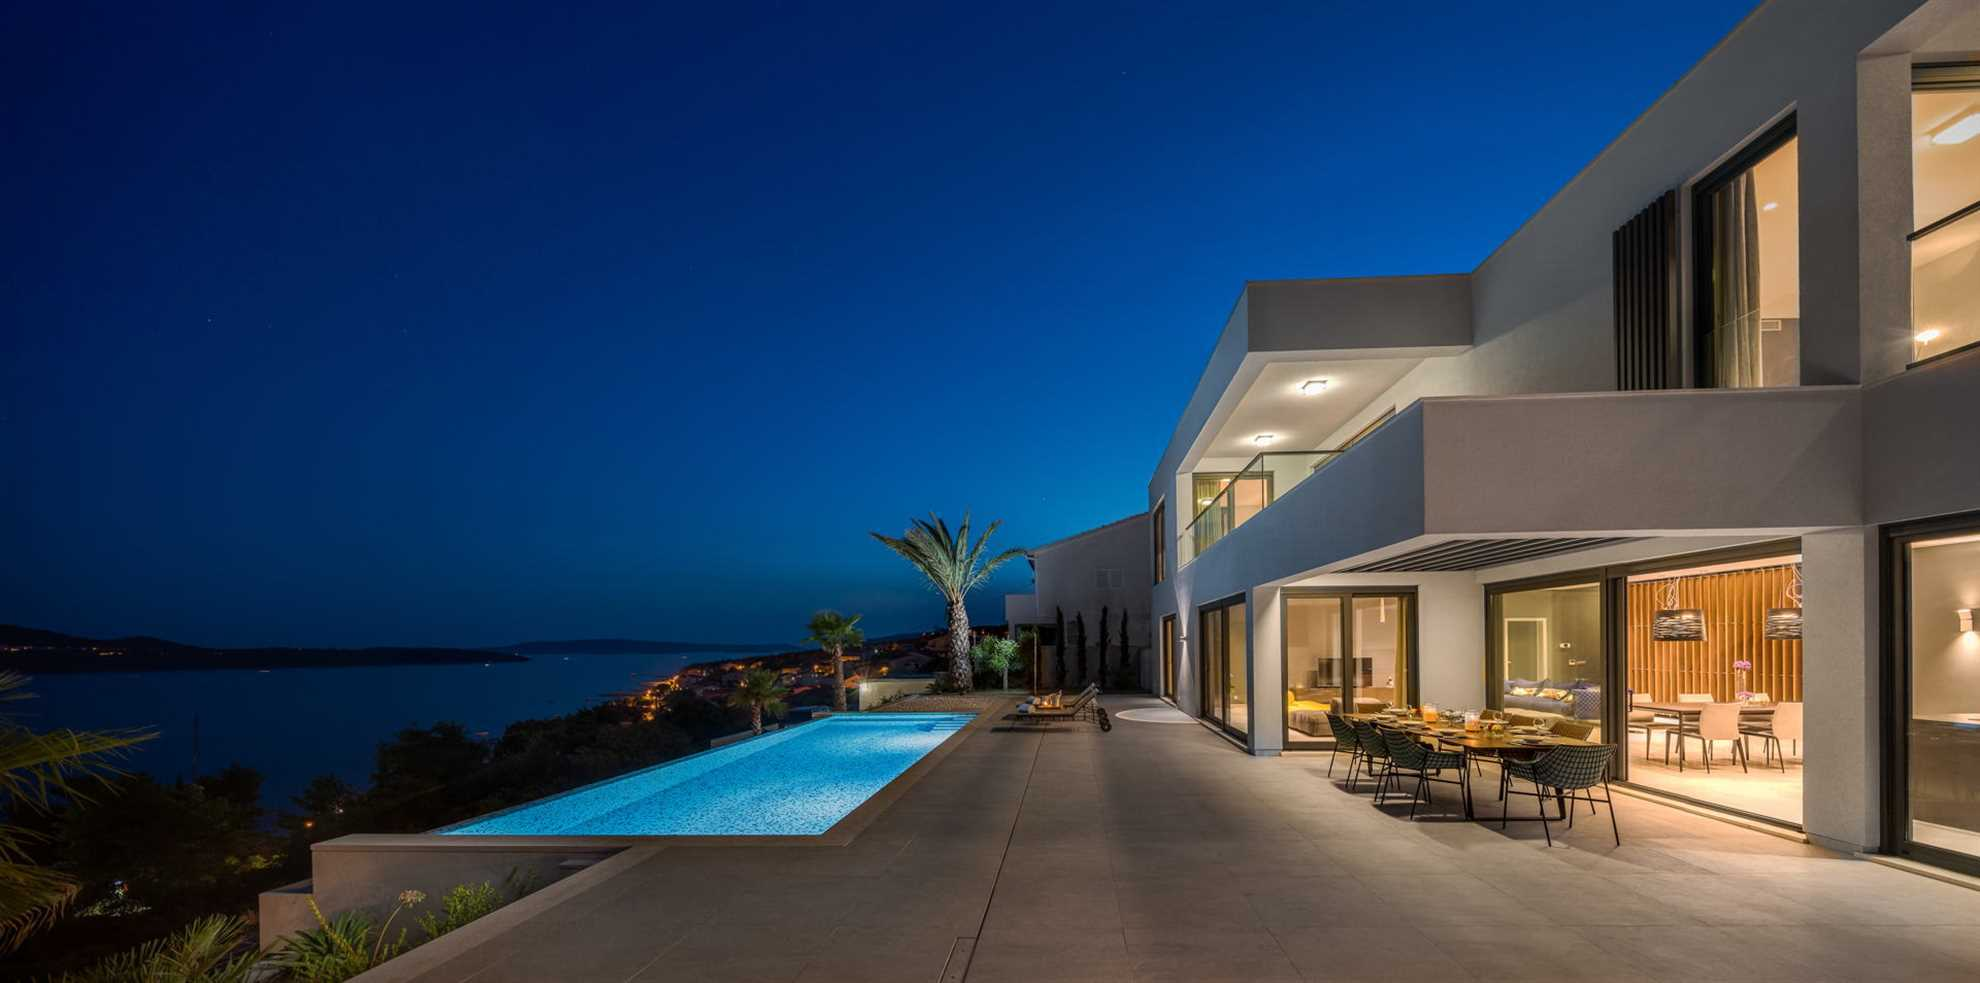 Ultraluxury Villa Elyzeum with Heated Pool in Trogir area